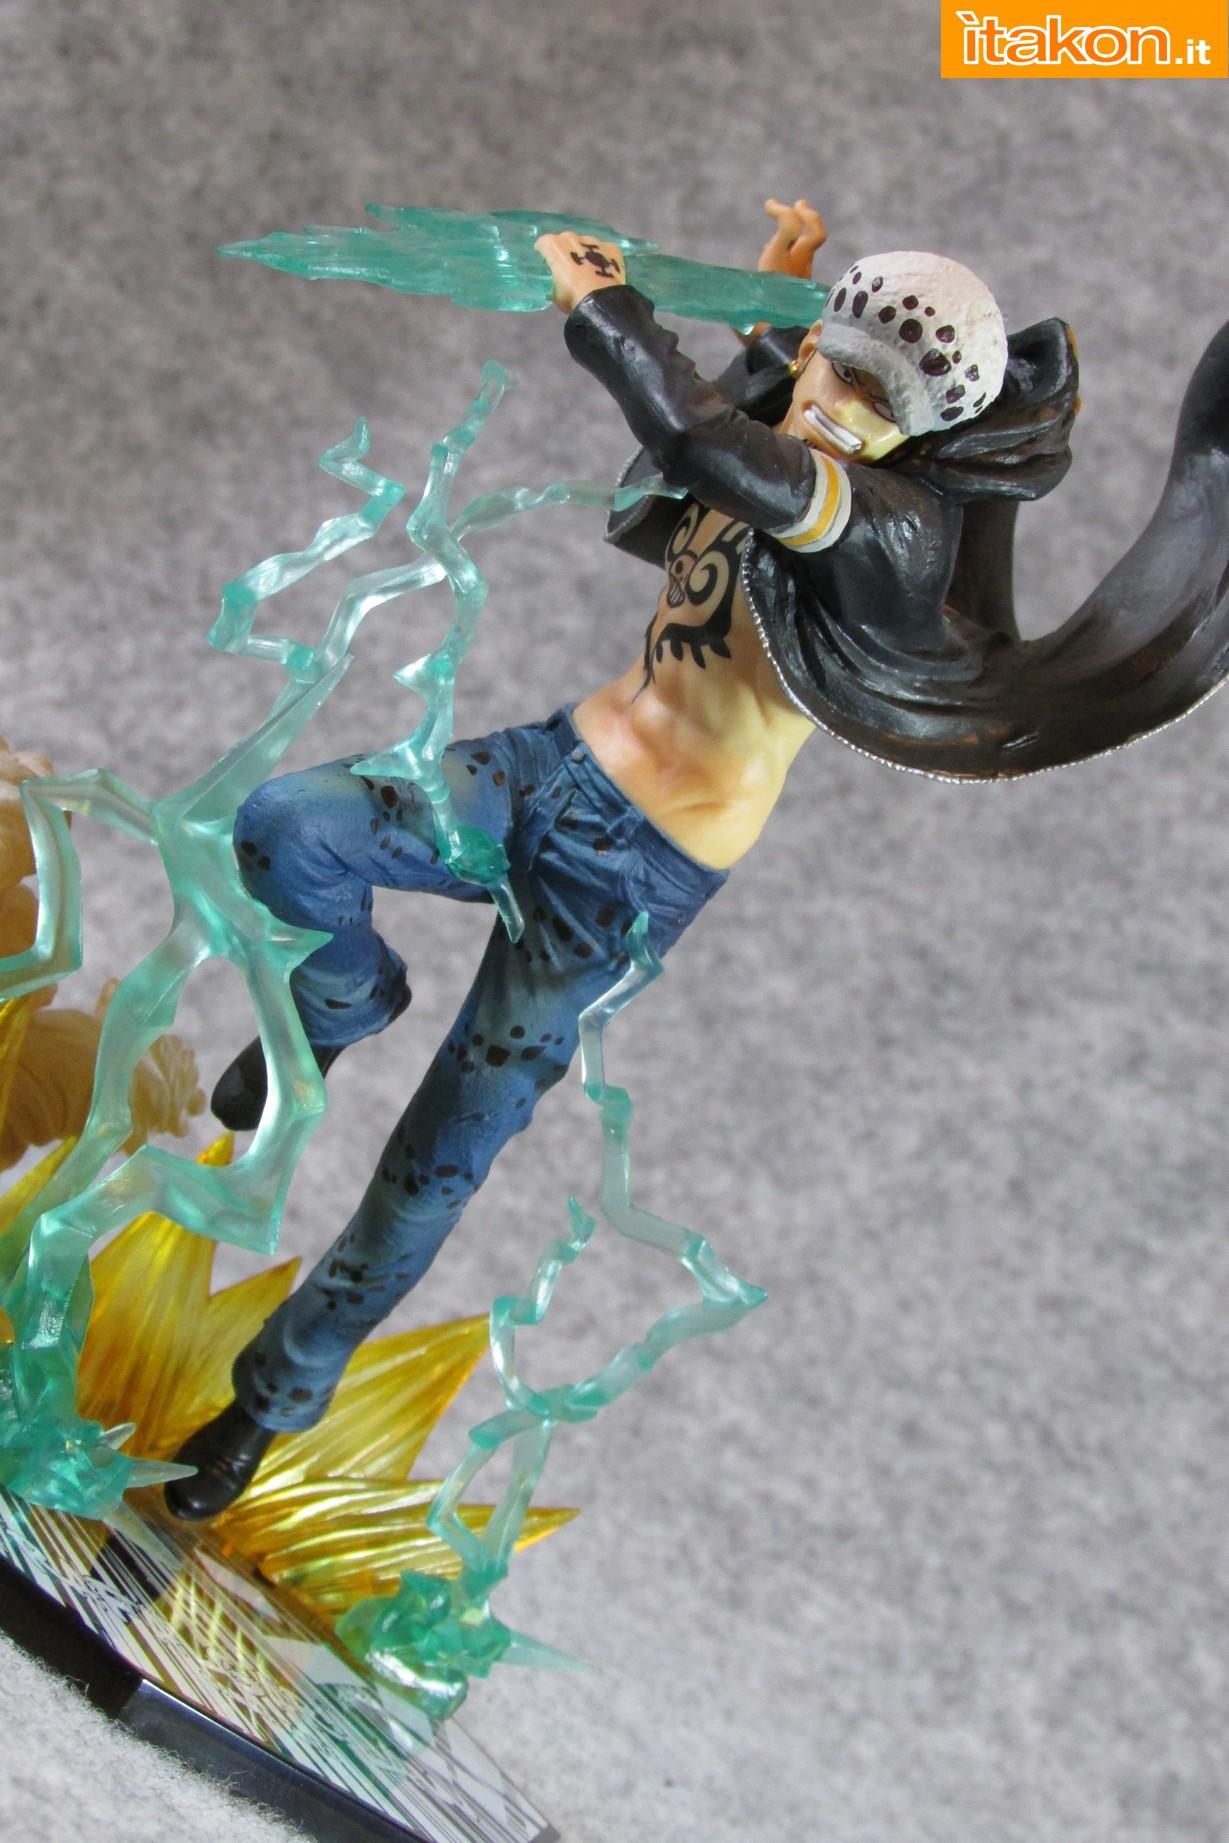 Link a One Piece Trafalgar Law Gamma Knife Figuarts ZERO Chou Gekisen Extra Battle Recensione Review Itakon.it 17